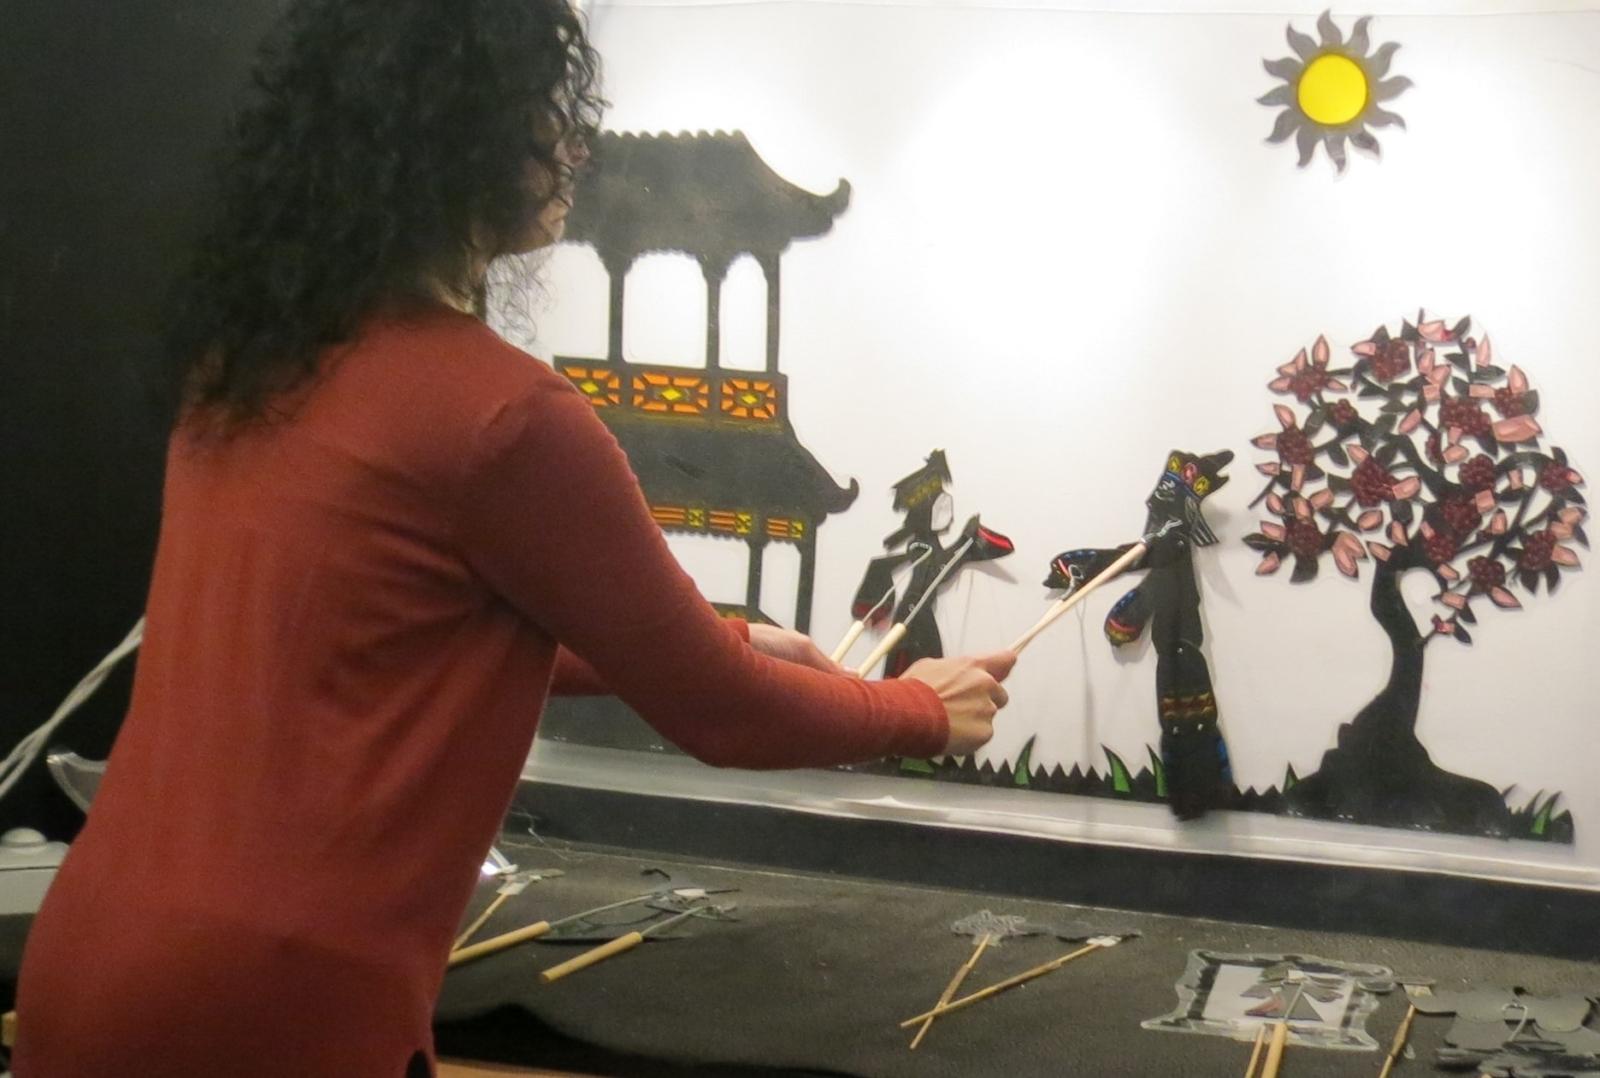 Mediadora a manipular marionetas de sombra